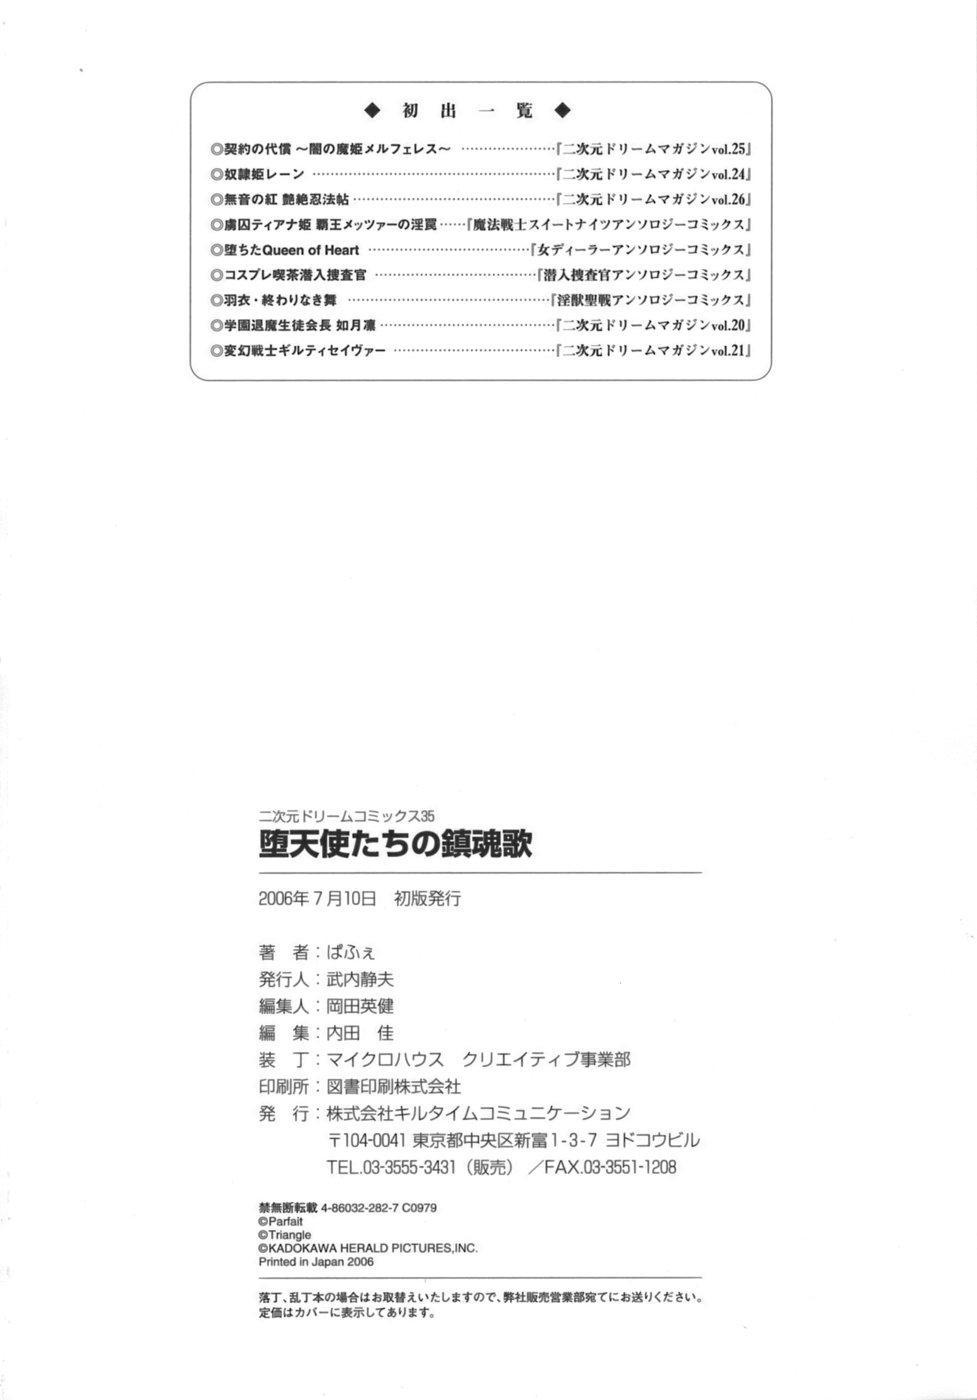 [Parfait] Datenshi-tachi no Chinkonka - Fallen Angels Requiem 162